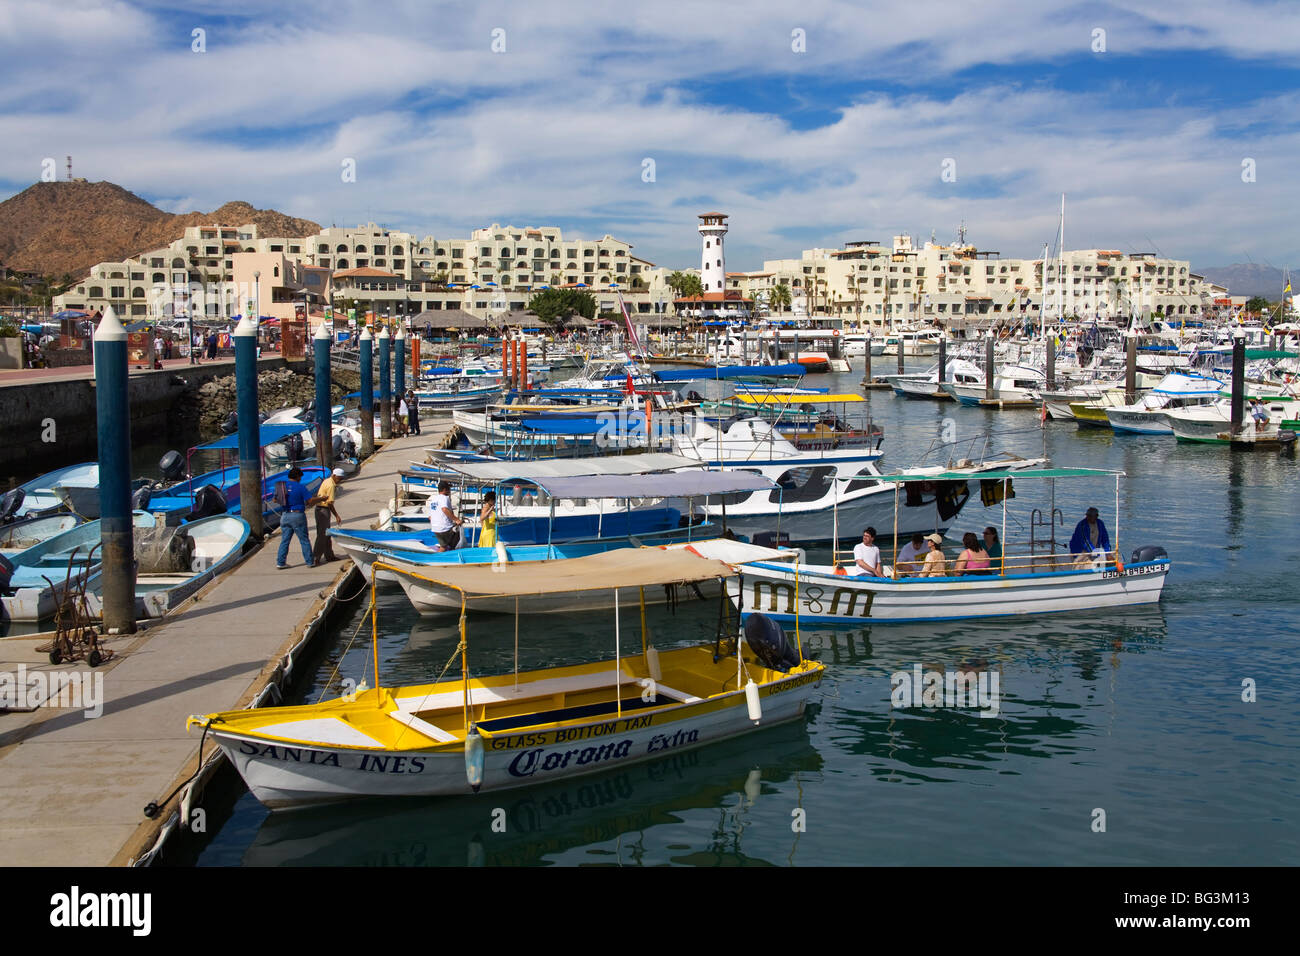 Marina, Cabo San Lucas, Baja California, Mexico, North America Stock Photo